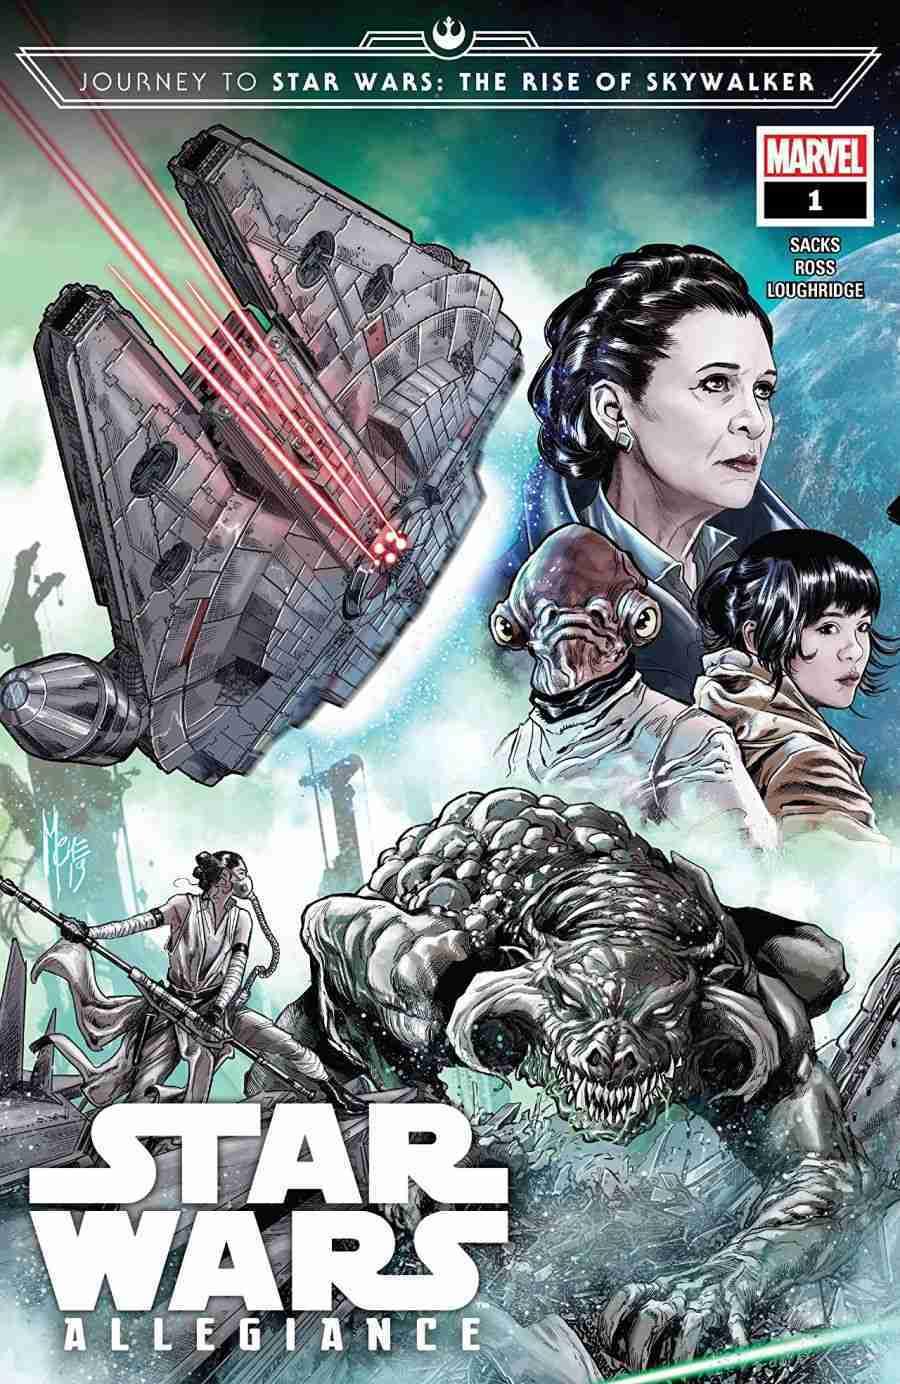 Journey To Star Wars The Rise Of Skywalker - Allegiance #1